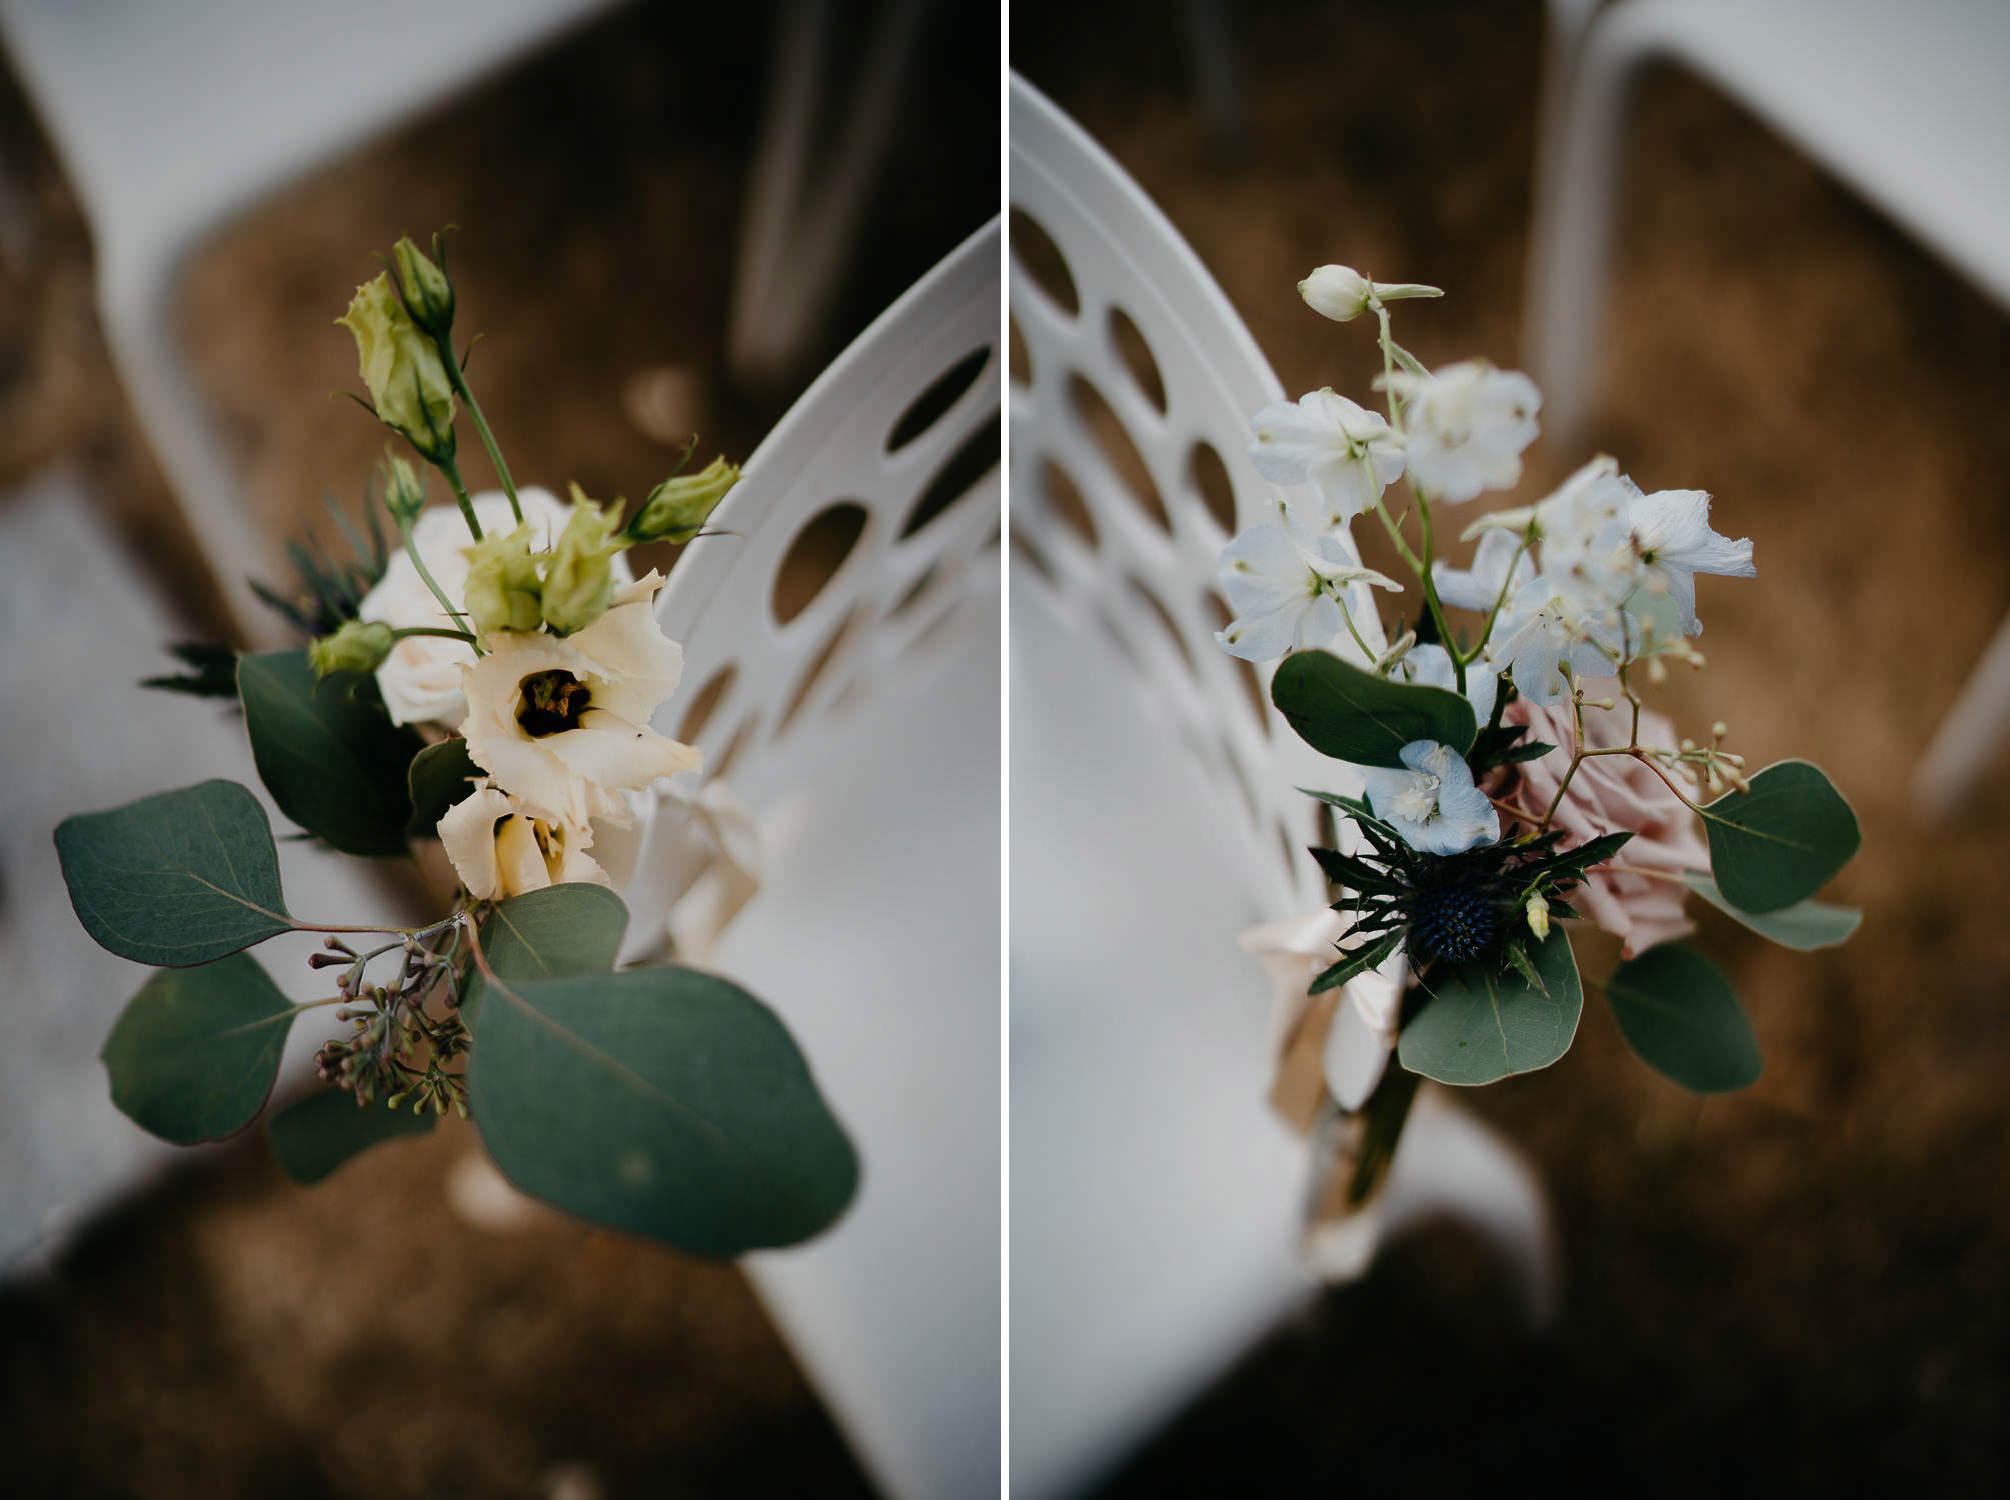 Wedding photographer Mark Hadden ceremony flowers details